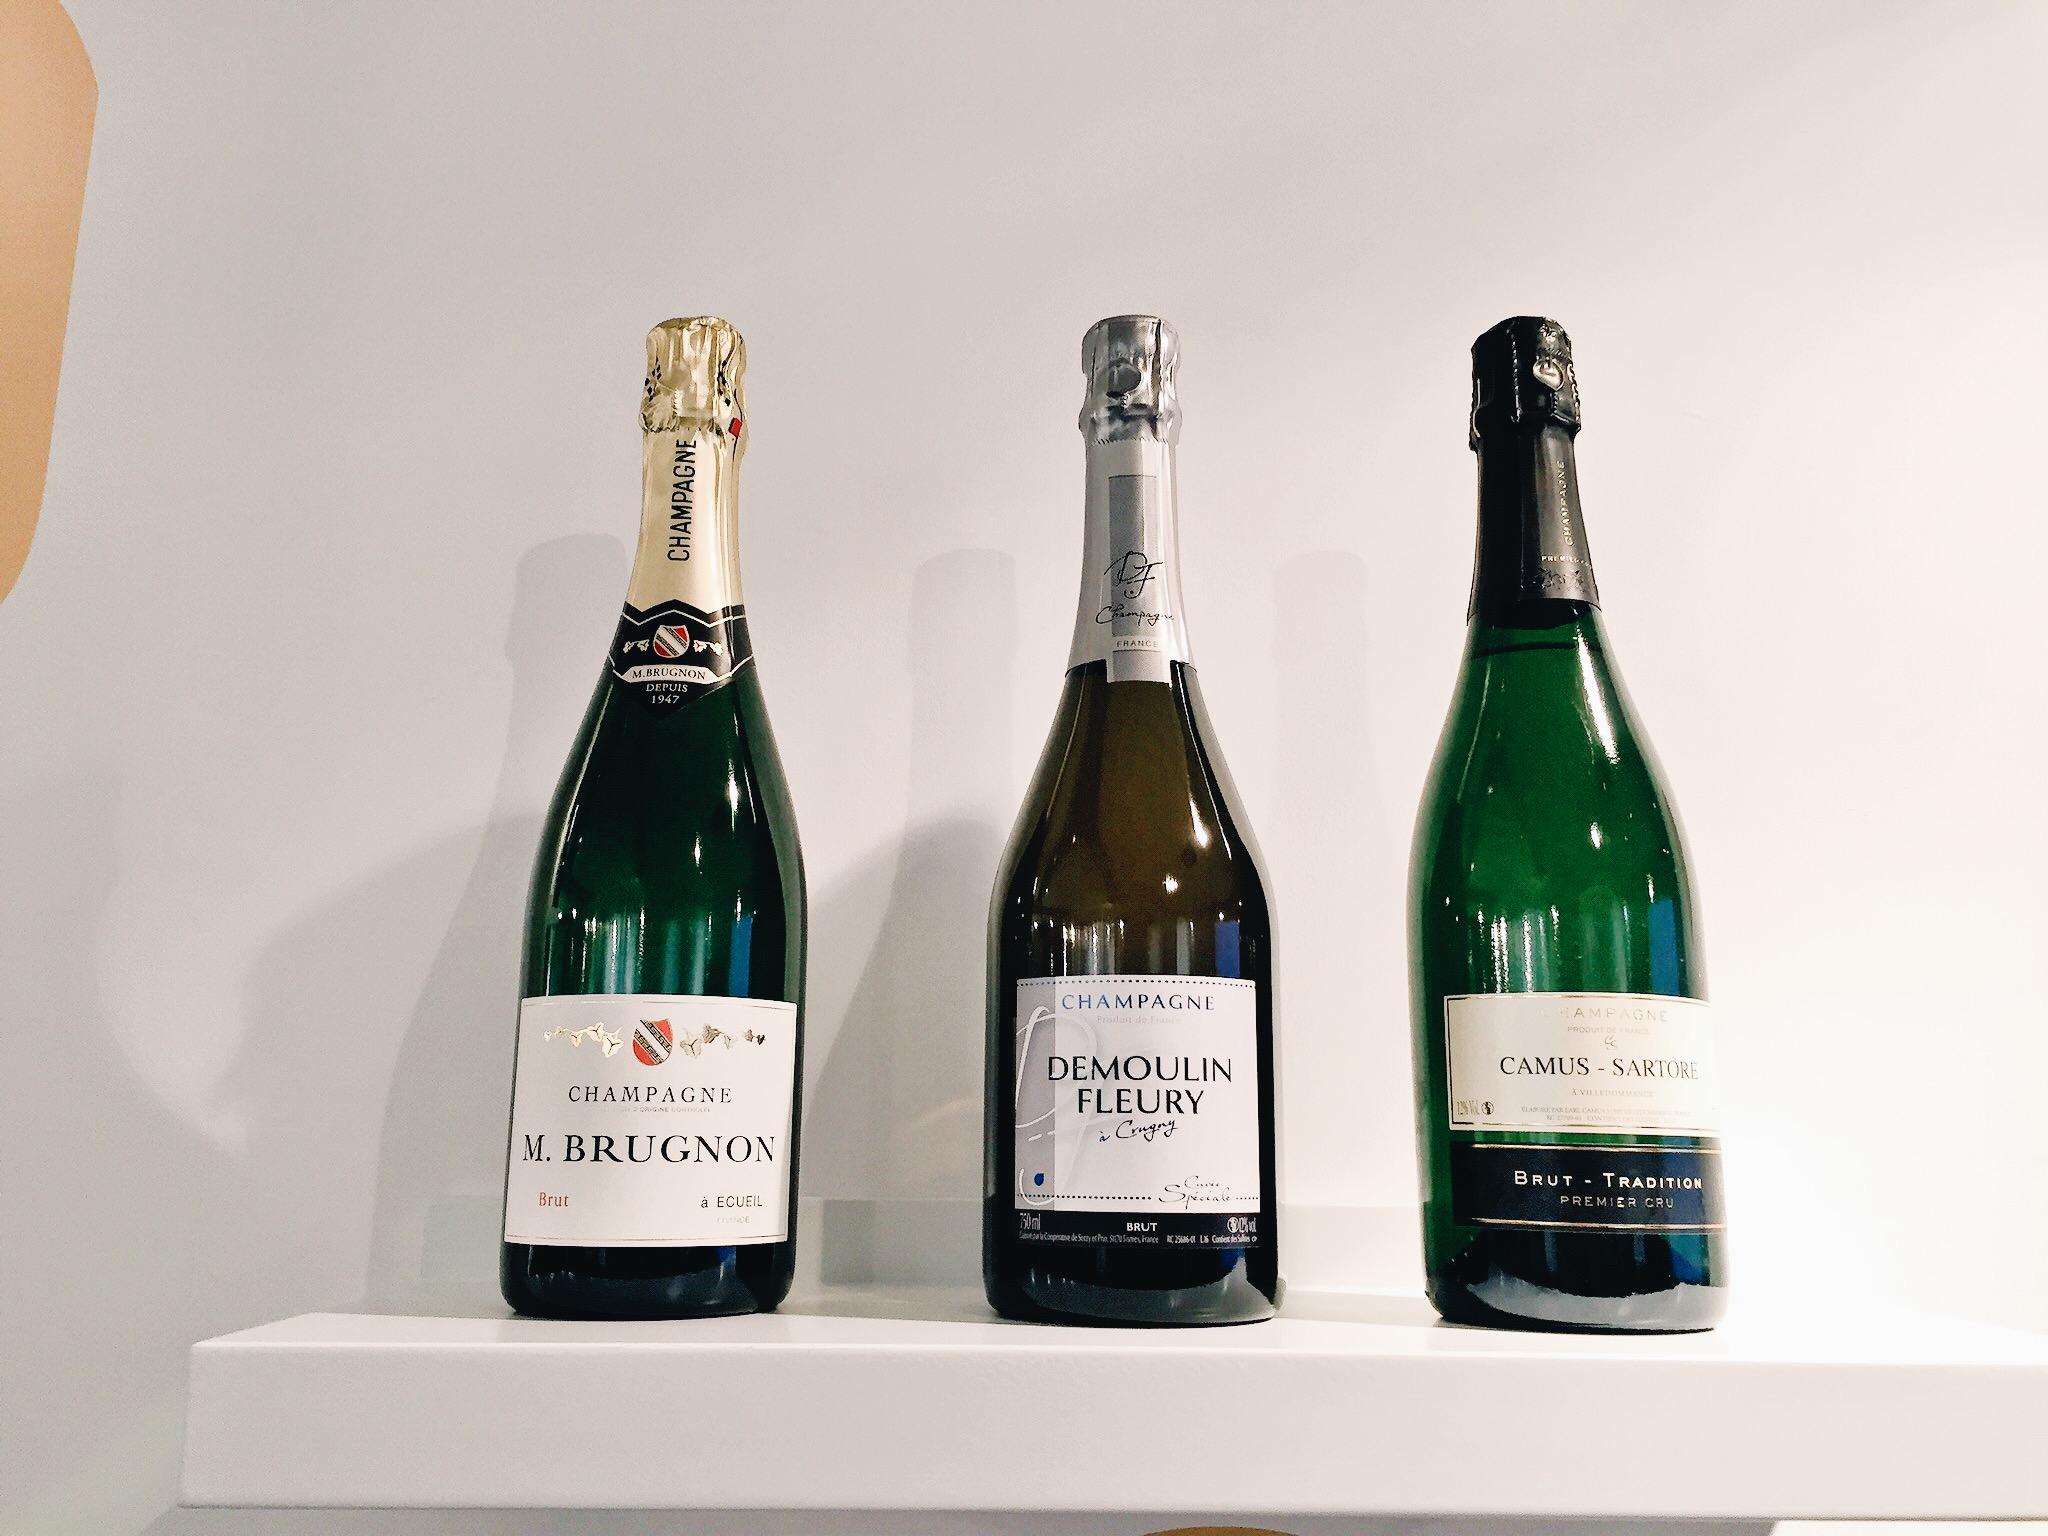 Champagne-M-Brugnon-Demoulin-Fleury-Camus-Sartore-Champagnes-de-Vignerons-photo-usofparis-blog